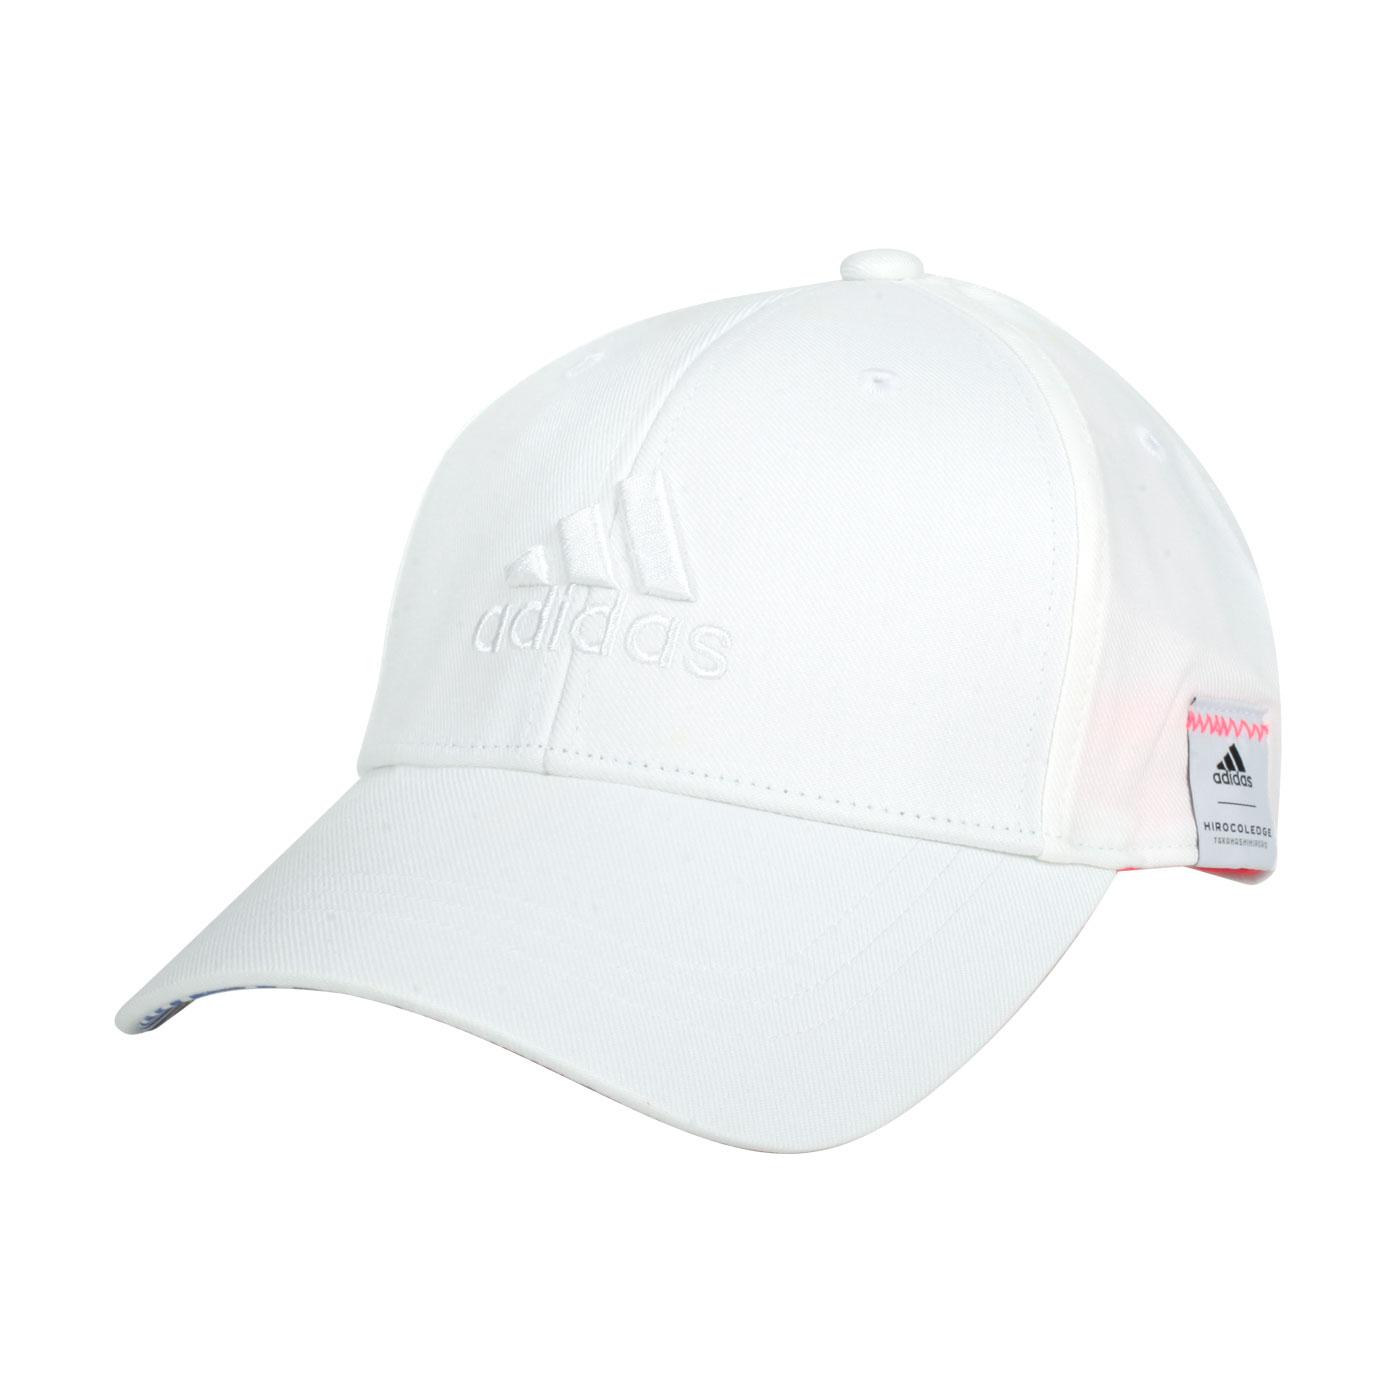 ADIDAS 帽子 GD4954 - 白